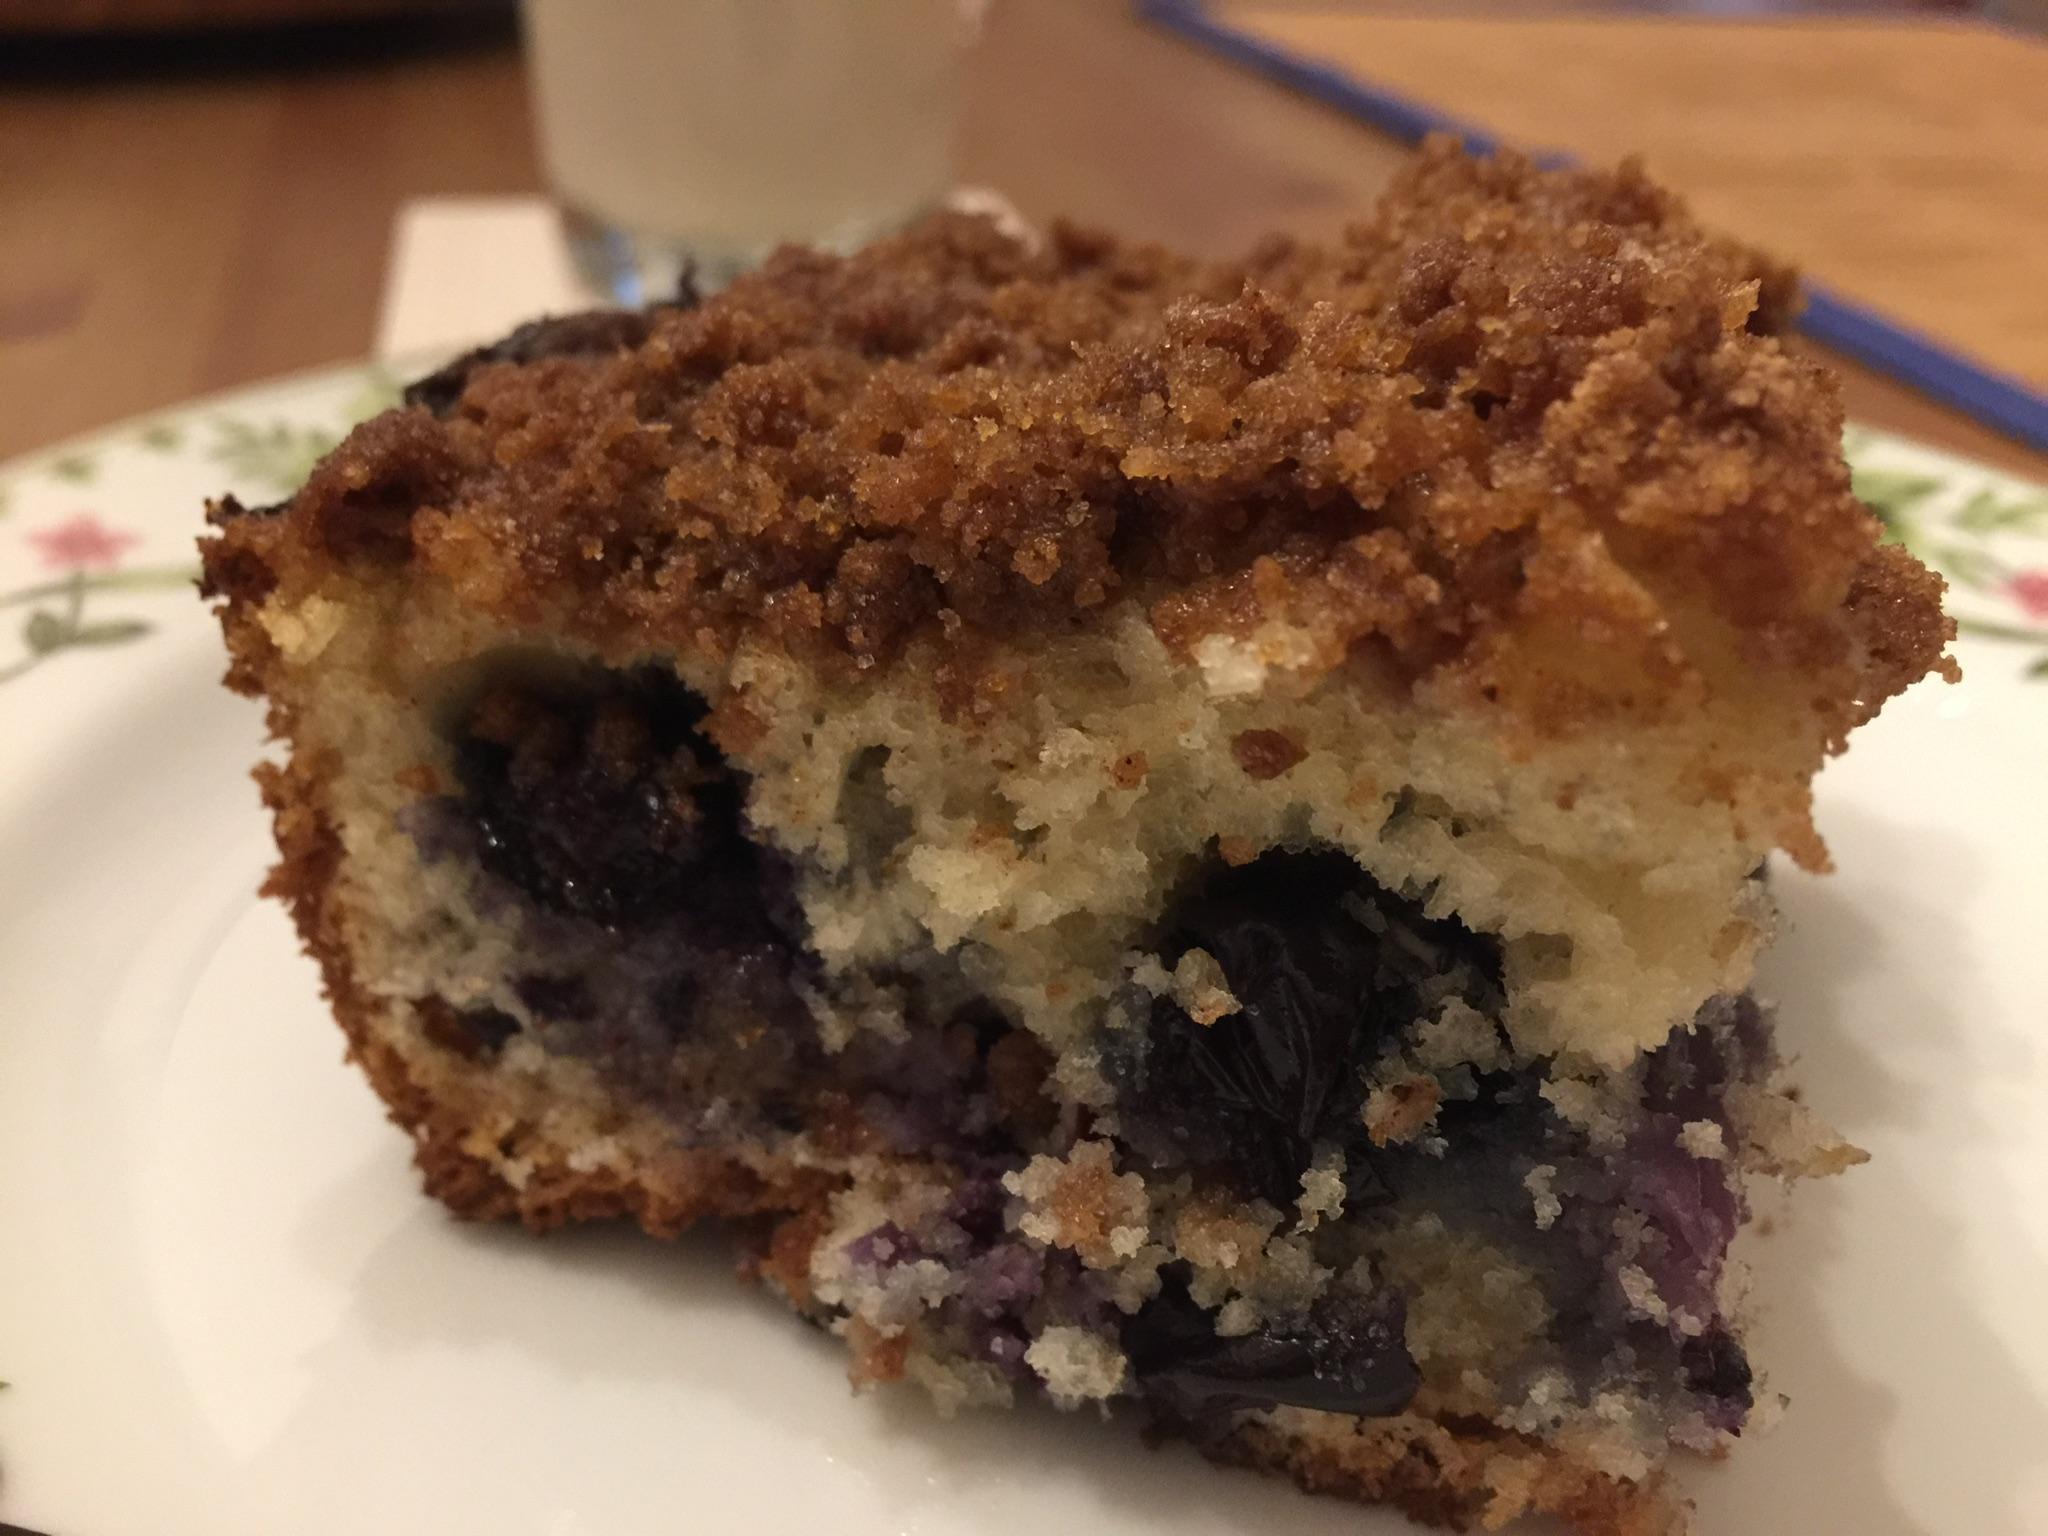 Blueberry Muffin Cake DebbieLynn